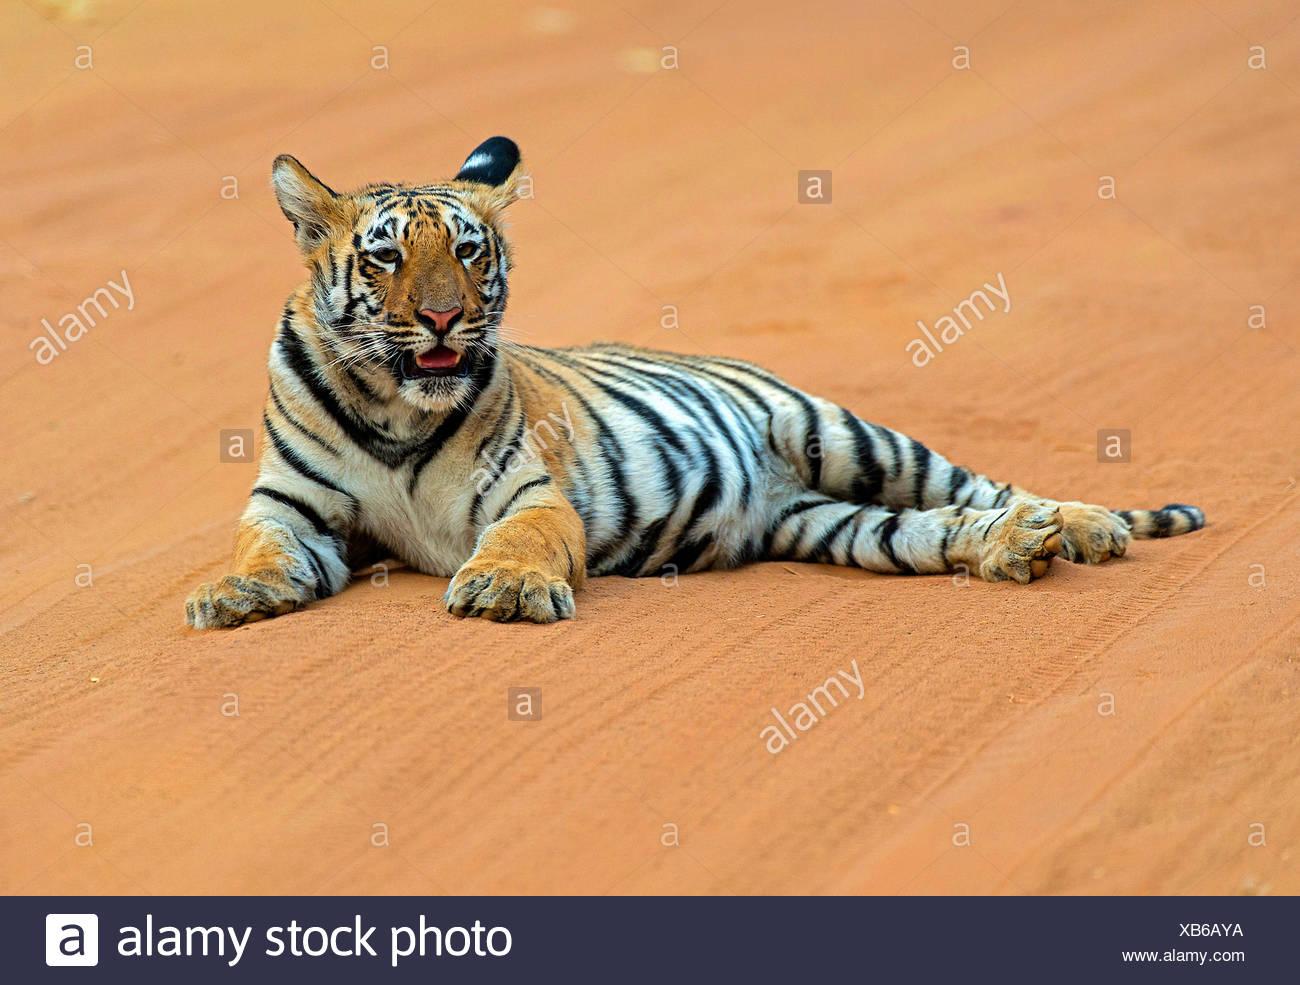 Koenigstiger, Indischer Tiger (Panthera Tigris Tigris), Bengaltiger Sechs Monate ändern Bengaltiger, Indien, Tadoba Nationalpark Stockbild